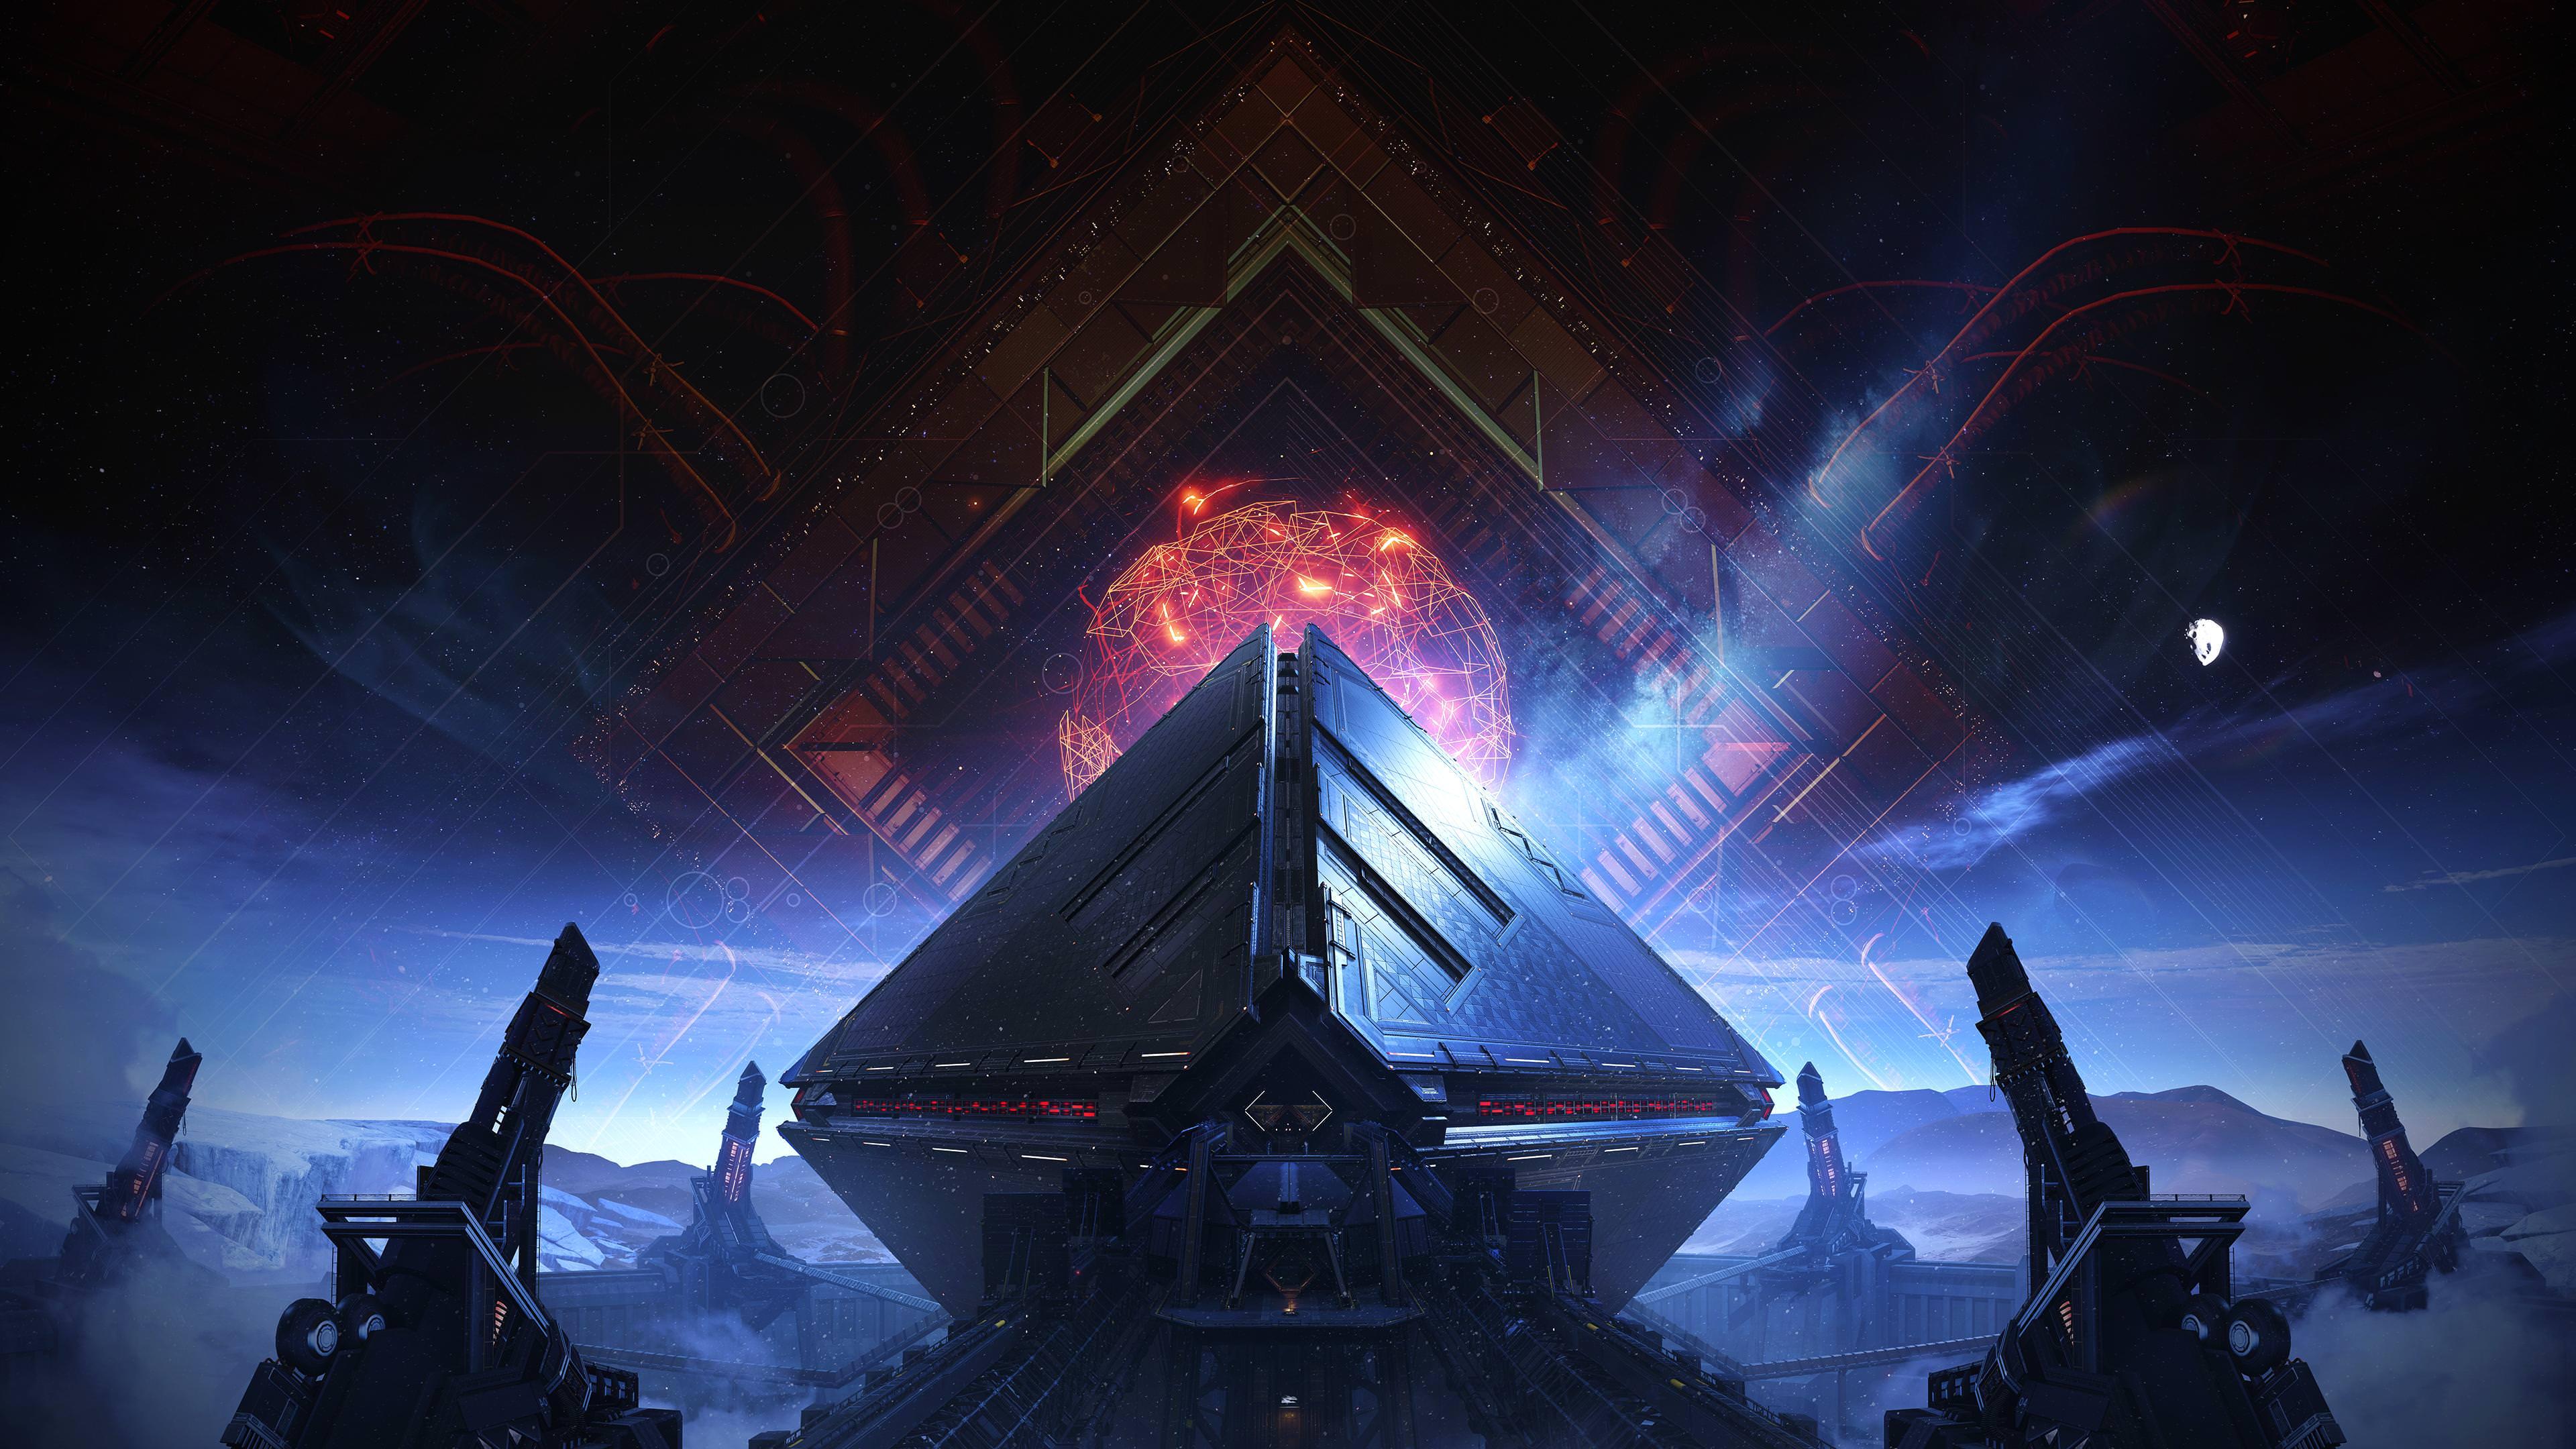 Destiny 2 Wallpapers - Top Free Destiny